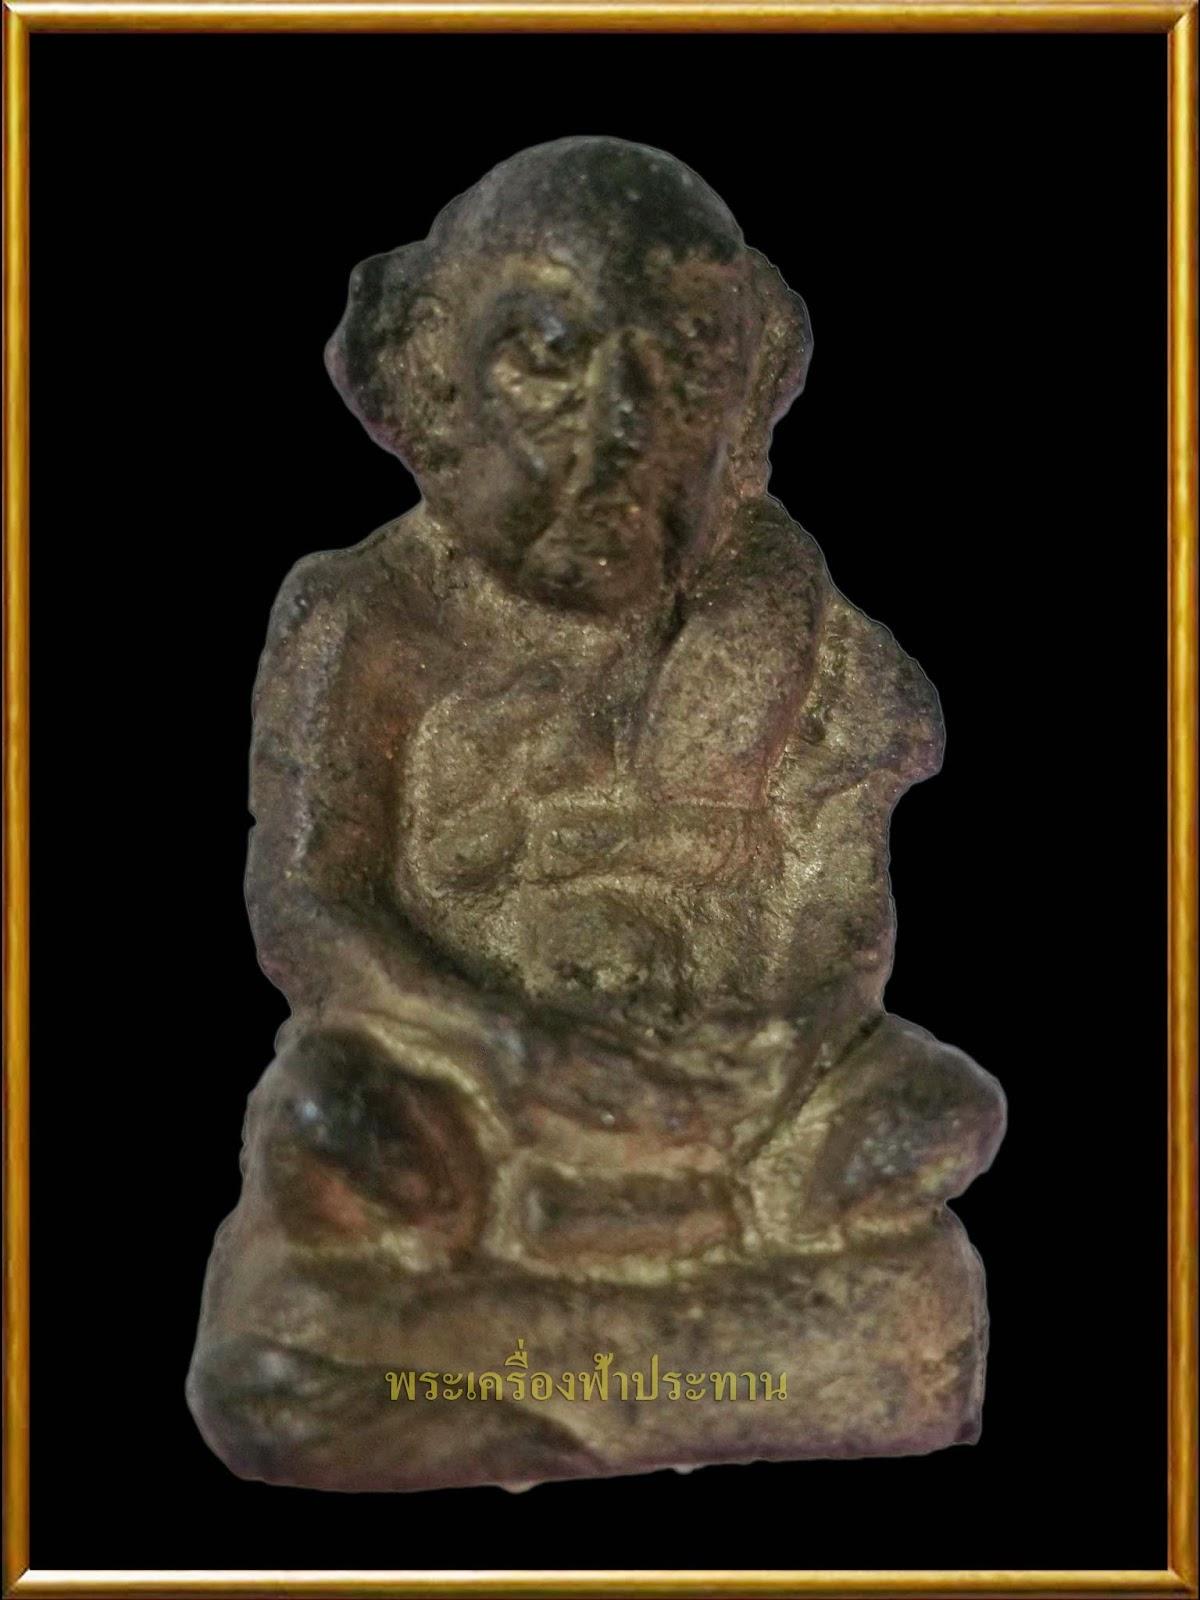 http://tubtimthong-amulet.blogspot.com/2012/10/blog-post_745.html